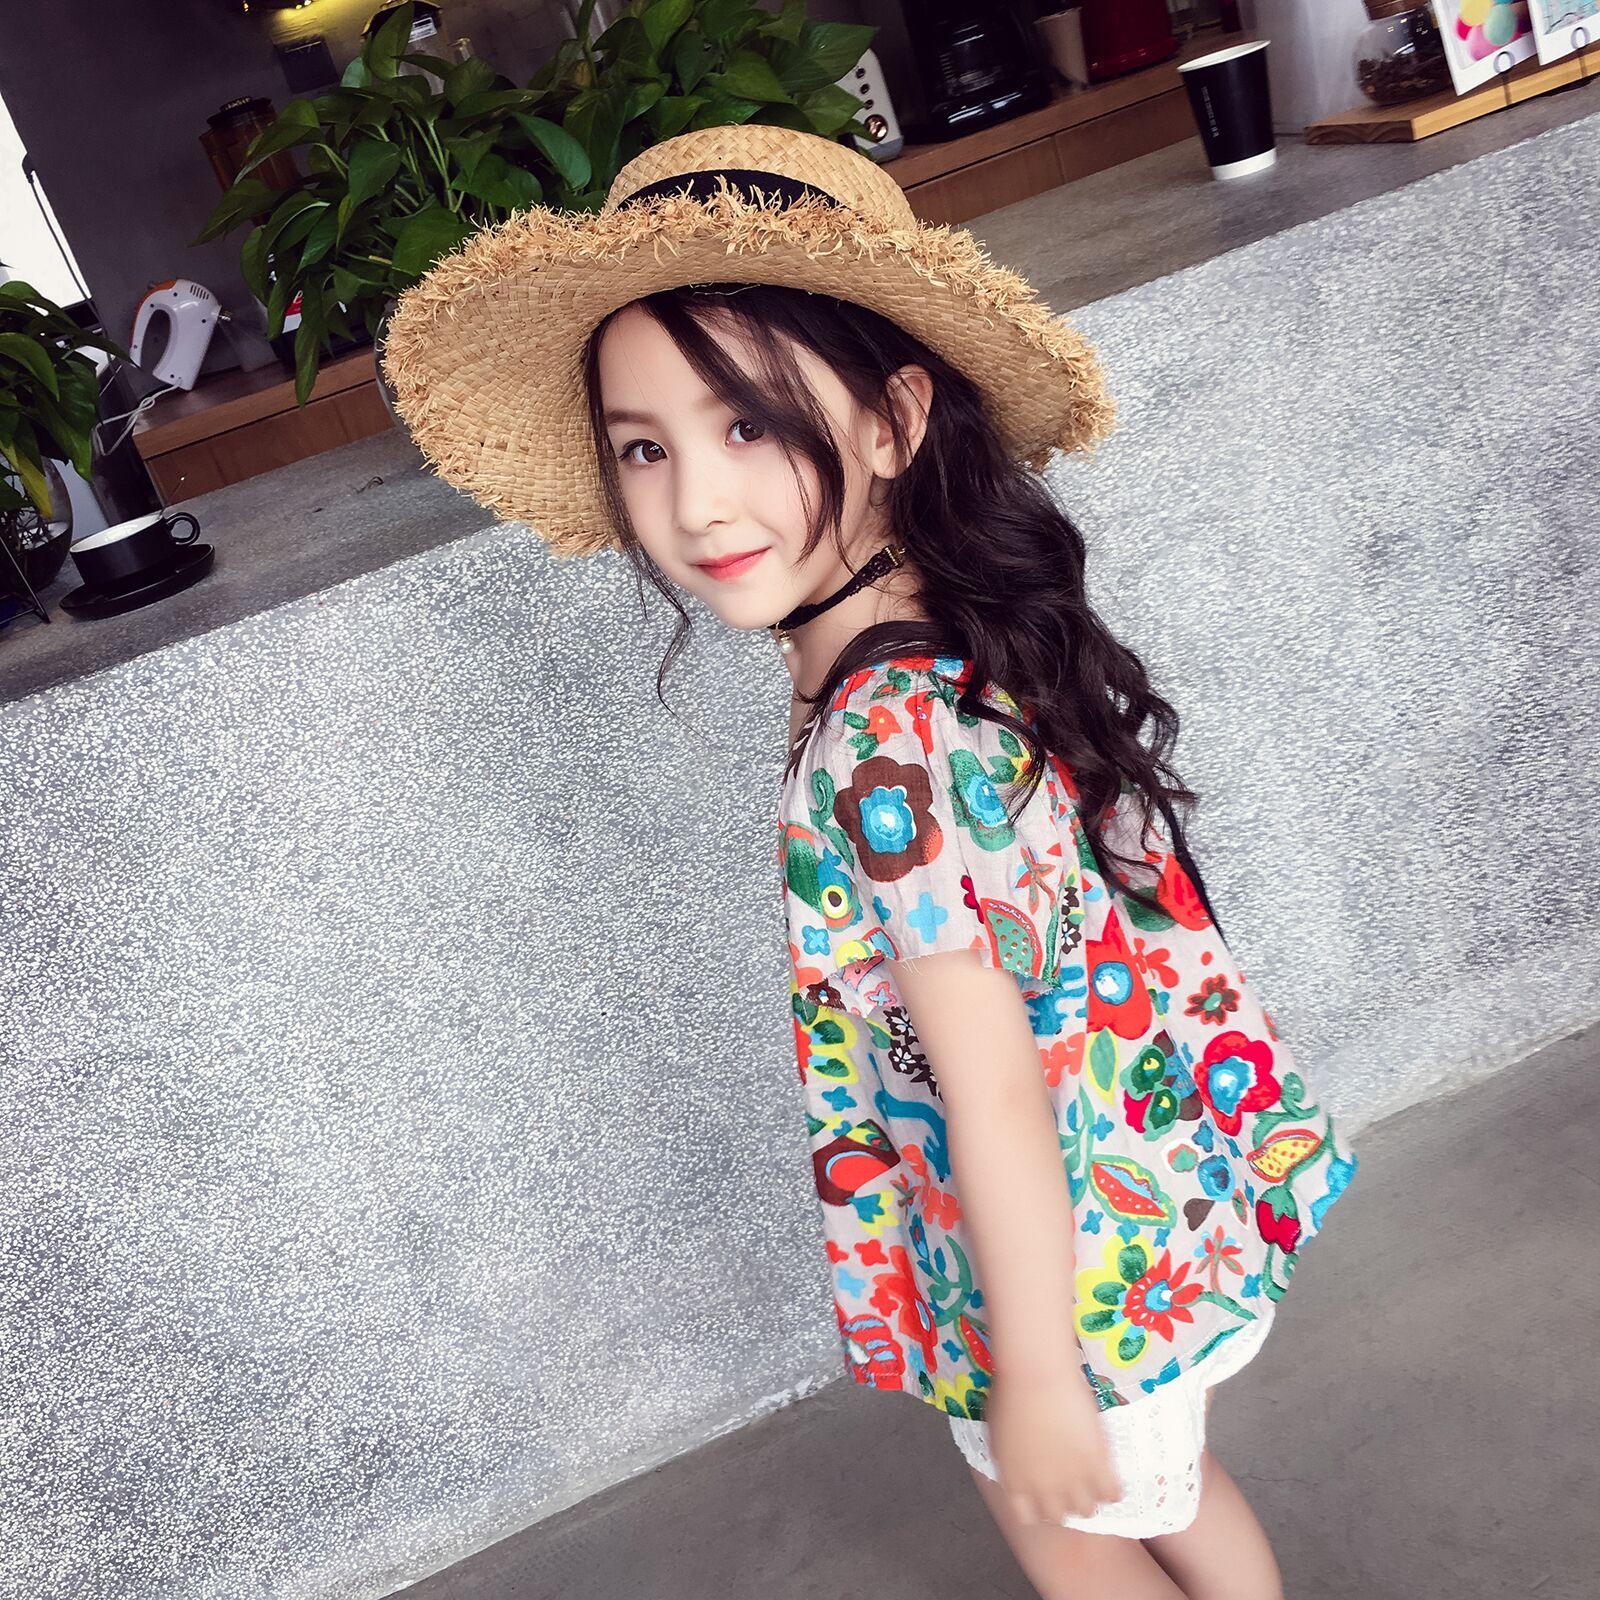 4c0b3538409 Girls short-sleeved shirt summer 2018 new beach holiday children s clothing  children s clothing casual bottoming shirt thin